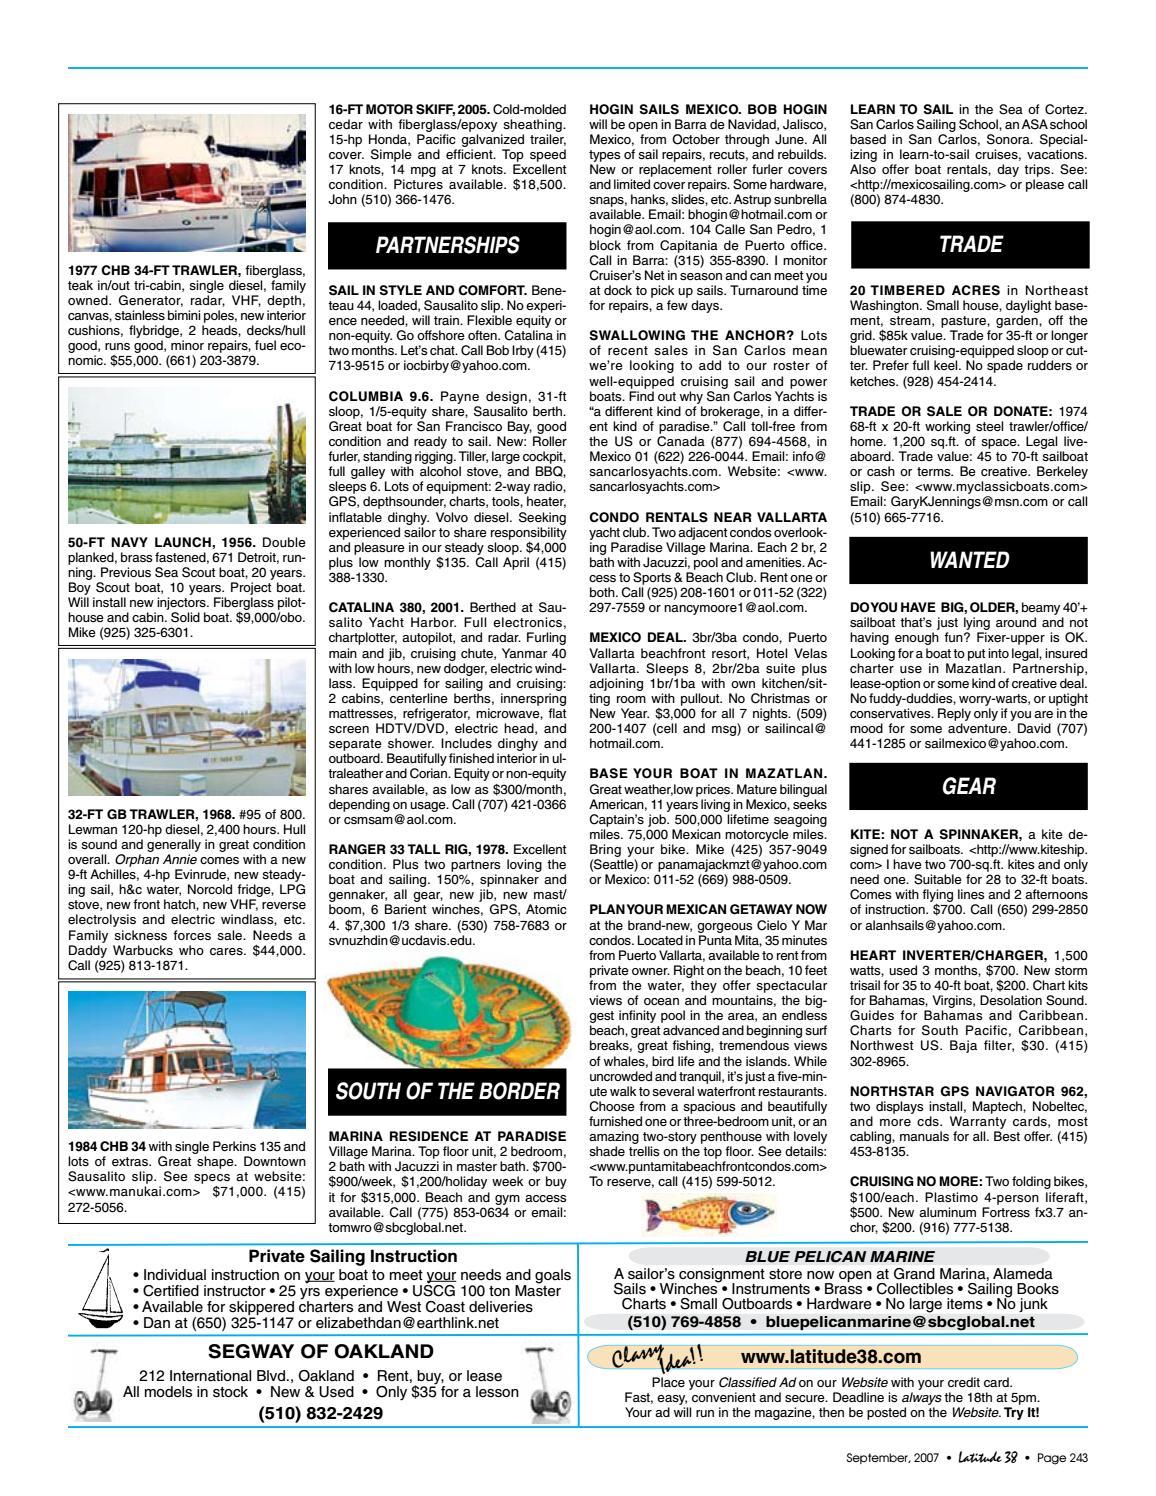 43f168edff462 Latitude 38 September 2007 by Latitude 38 Media